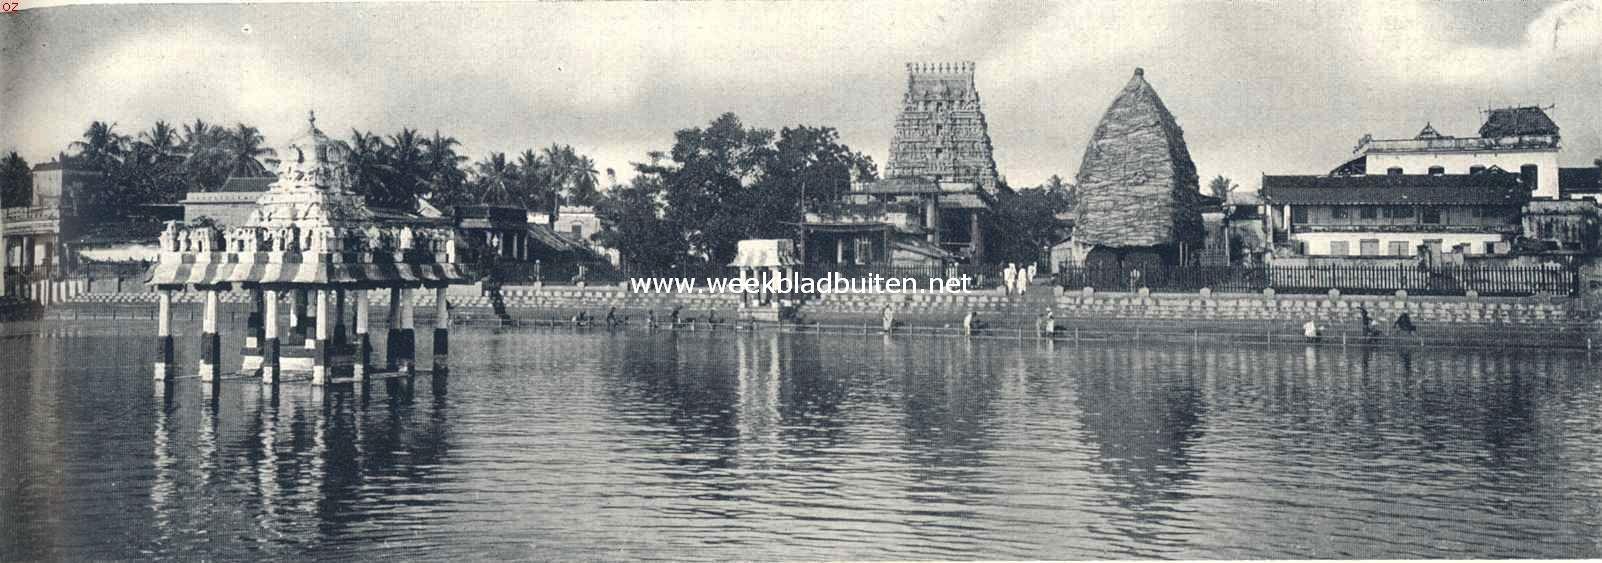 Mensch en godsdienst in Hindoestan. Heilige tempelvijver te Madras